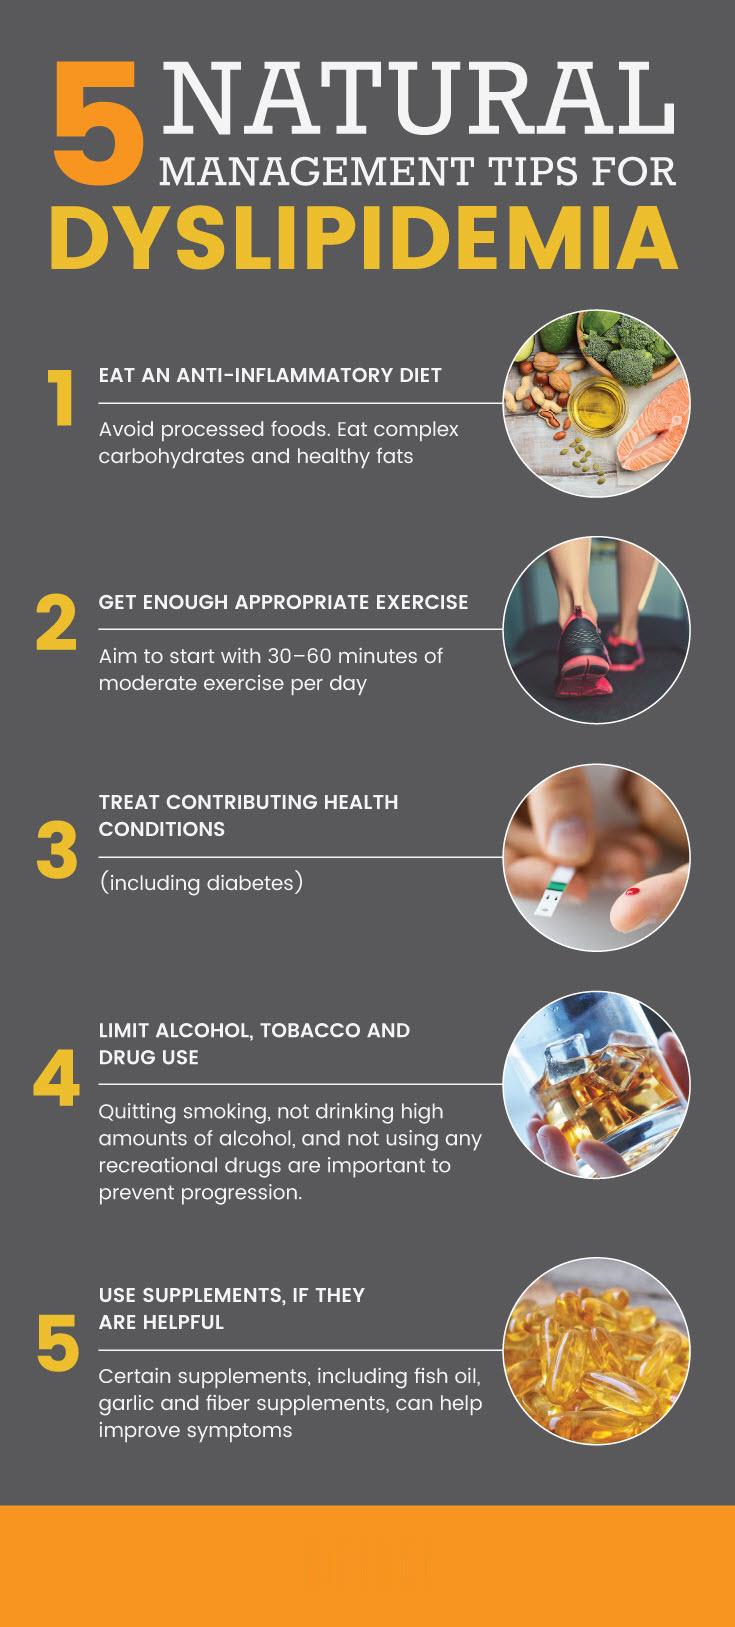 5 natural dyslipidemia treatments - MKexpress.net